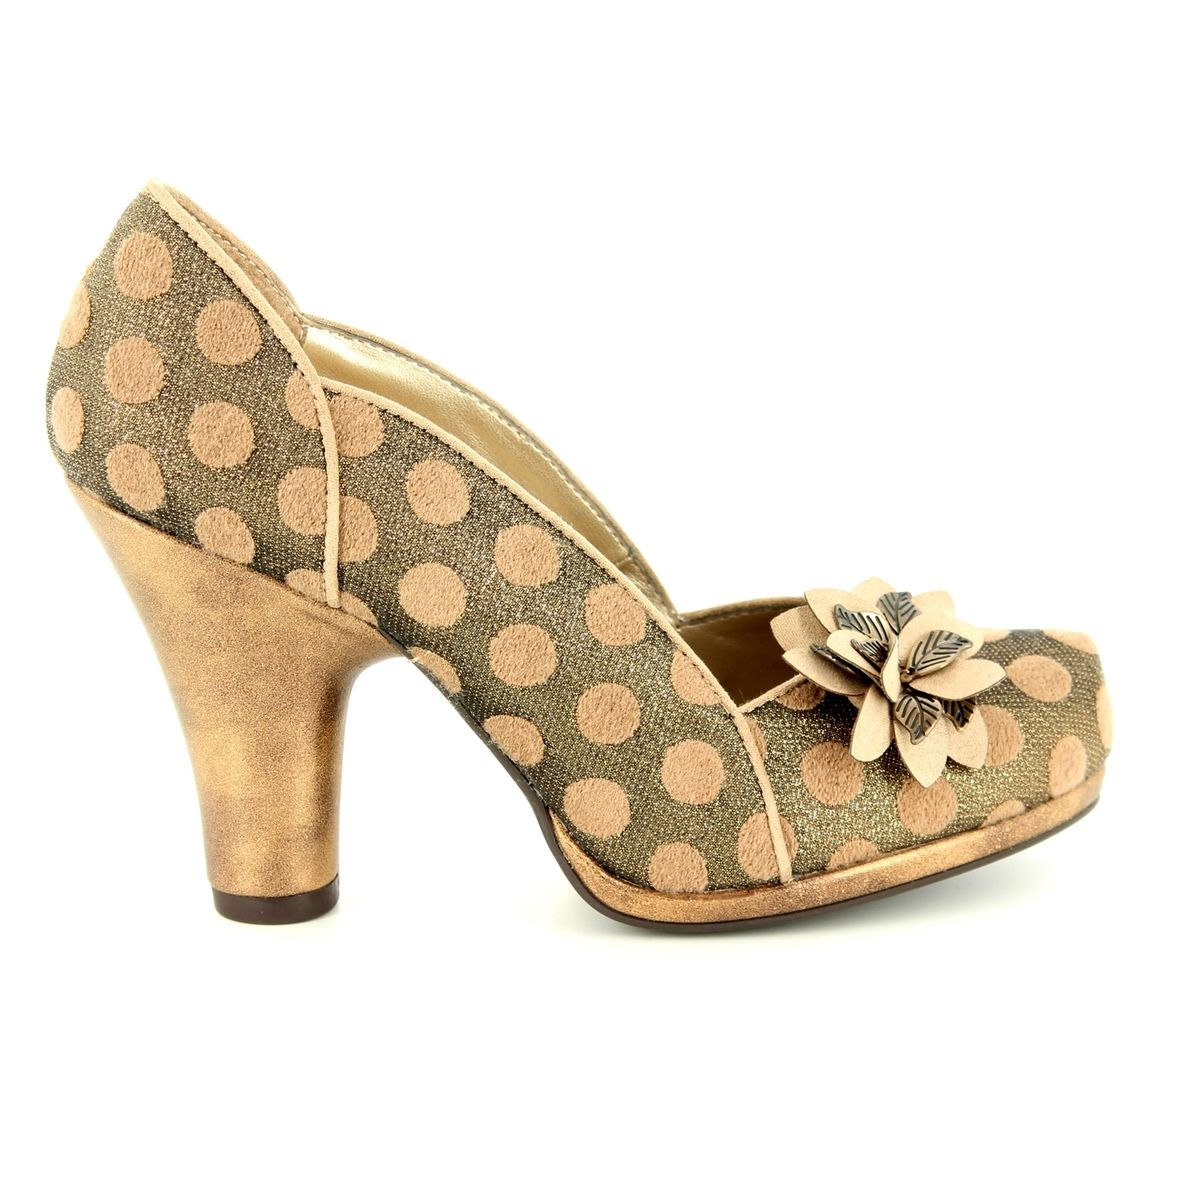 Ruby Shoo Charlie Gold Womens Hi Heels Shoes